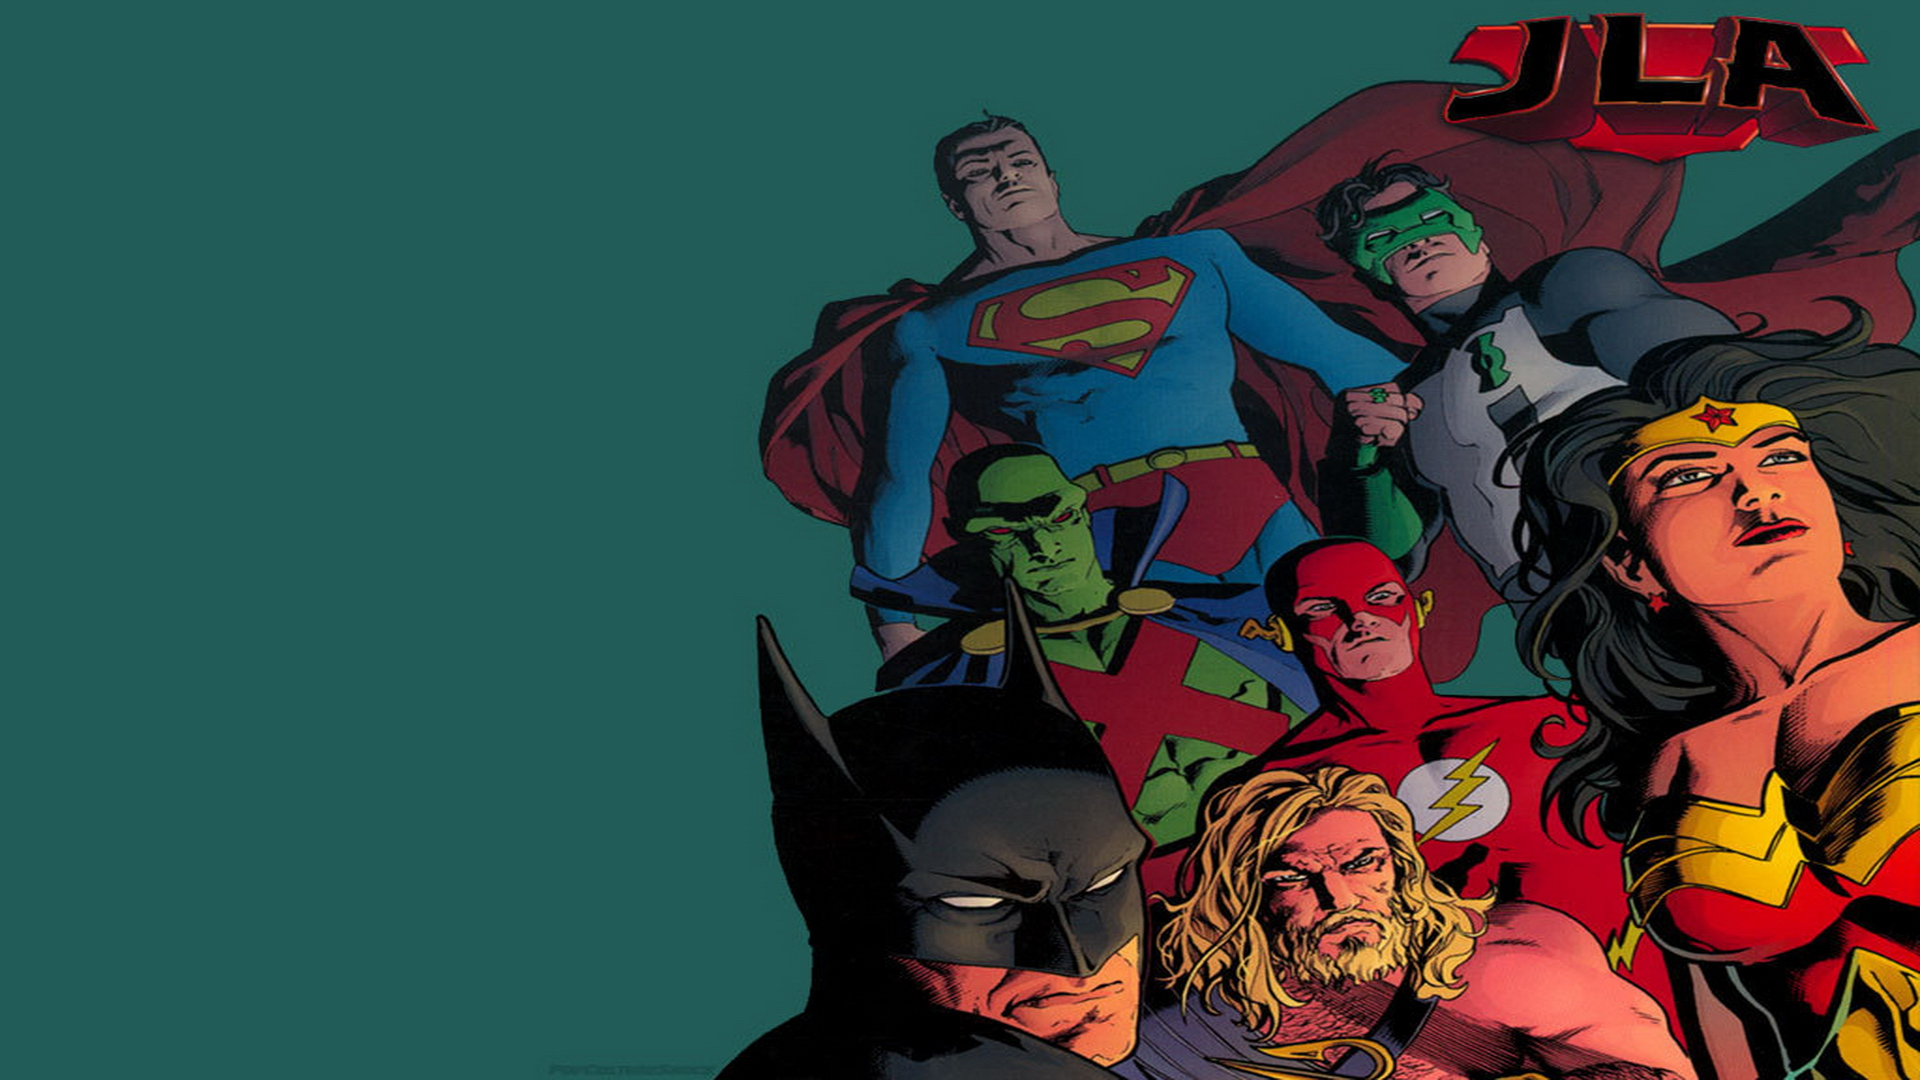 Justice League Wallpaper Hd 19201080 Justice league 1920x1080